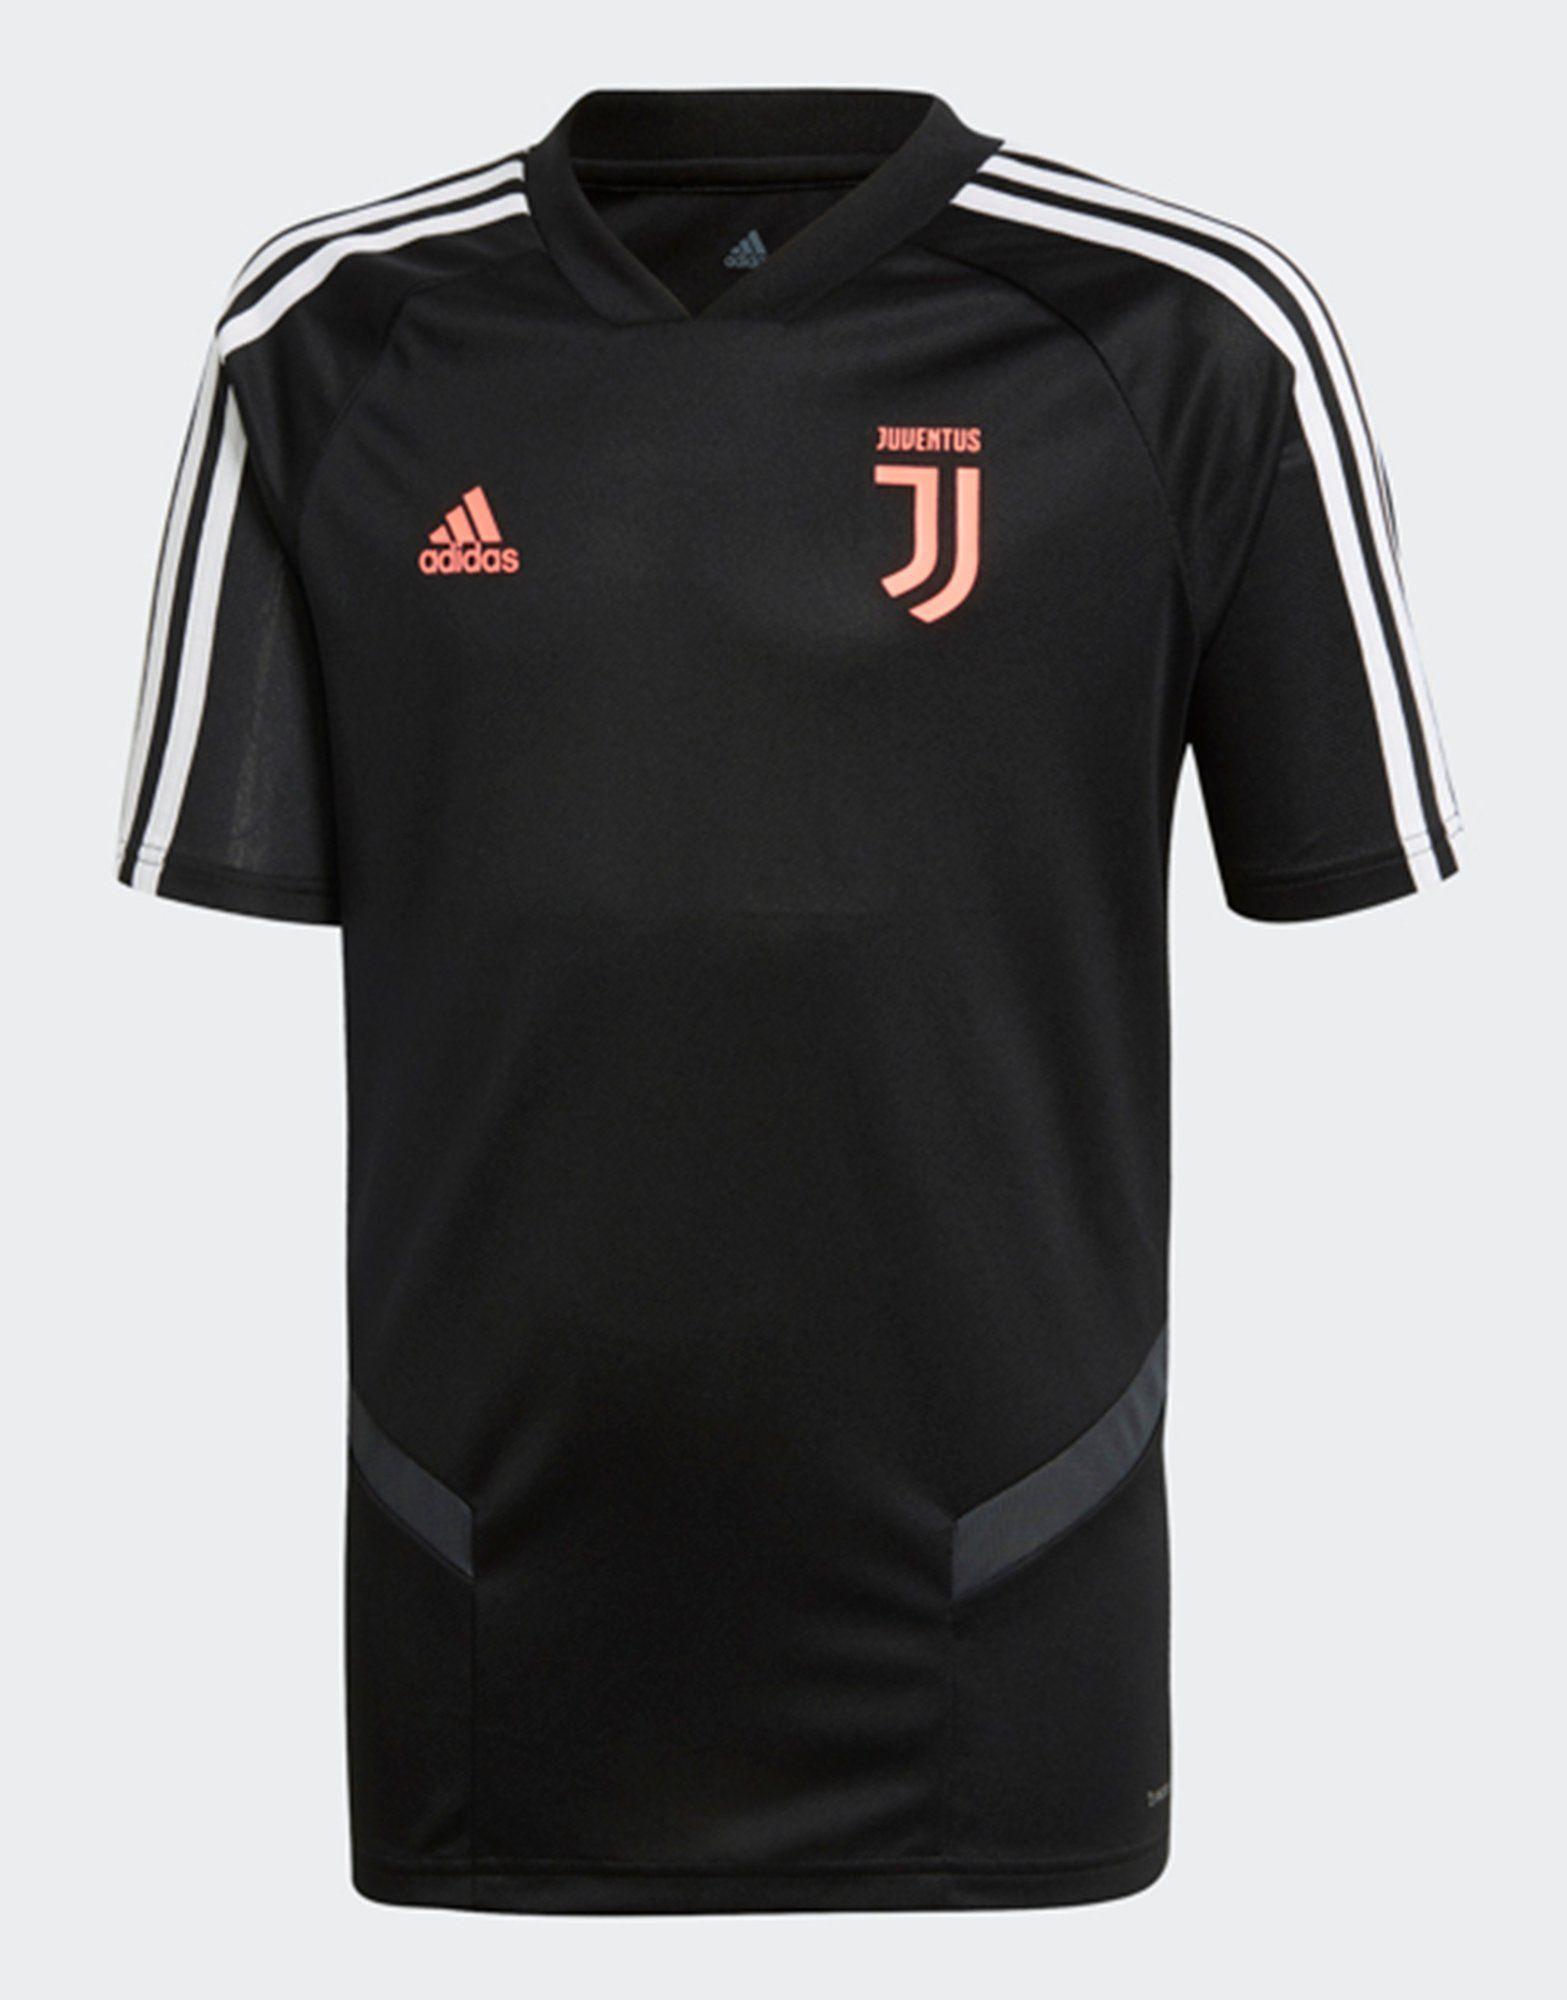 reputable site 39ad5 c07ec adidas Performance Juventus Training Jersey | JD Sports